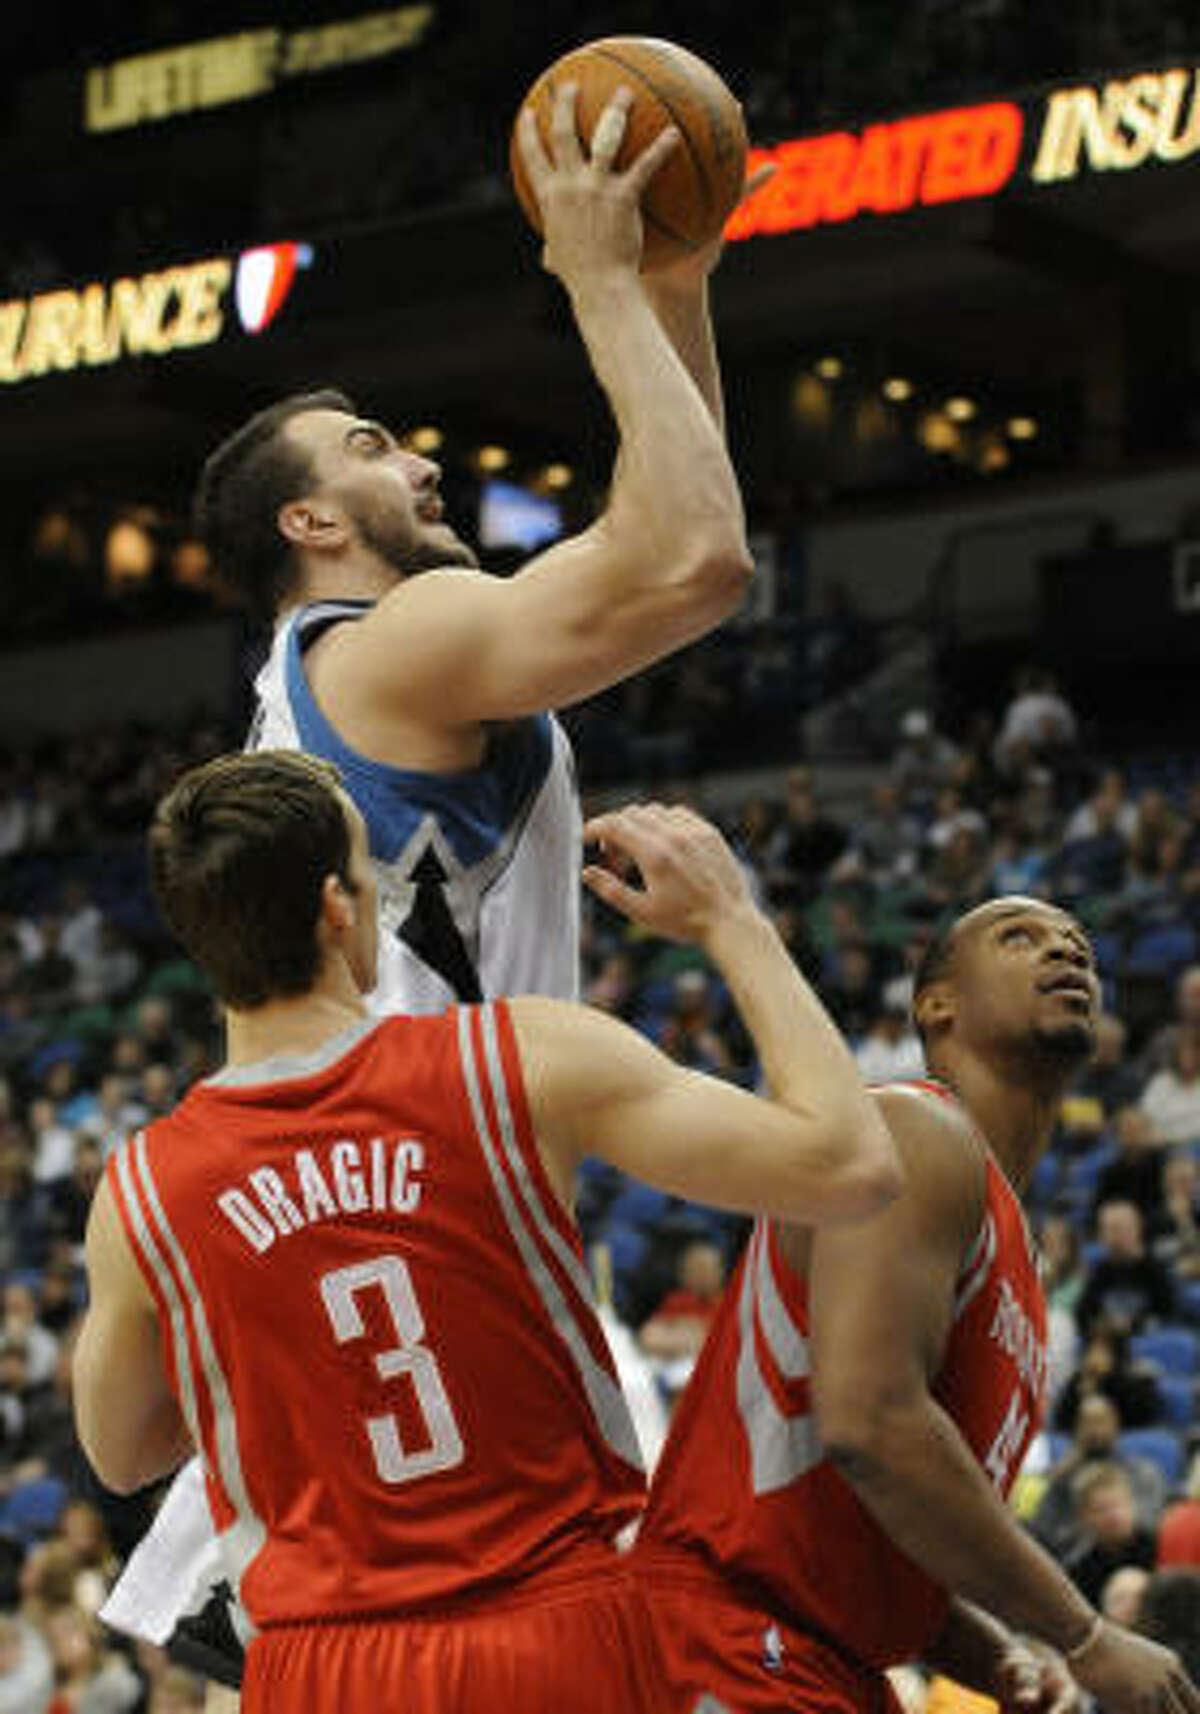 Timberwolves' Nikola Pekovic, center, shoots as Rockets' Goran Dragic (3) and Chuck Hayes, right, watch.